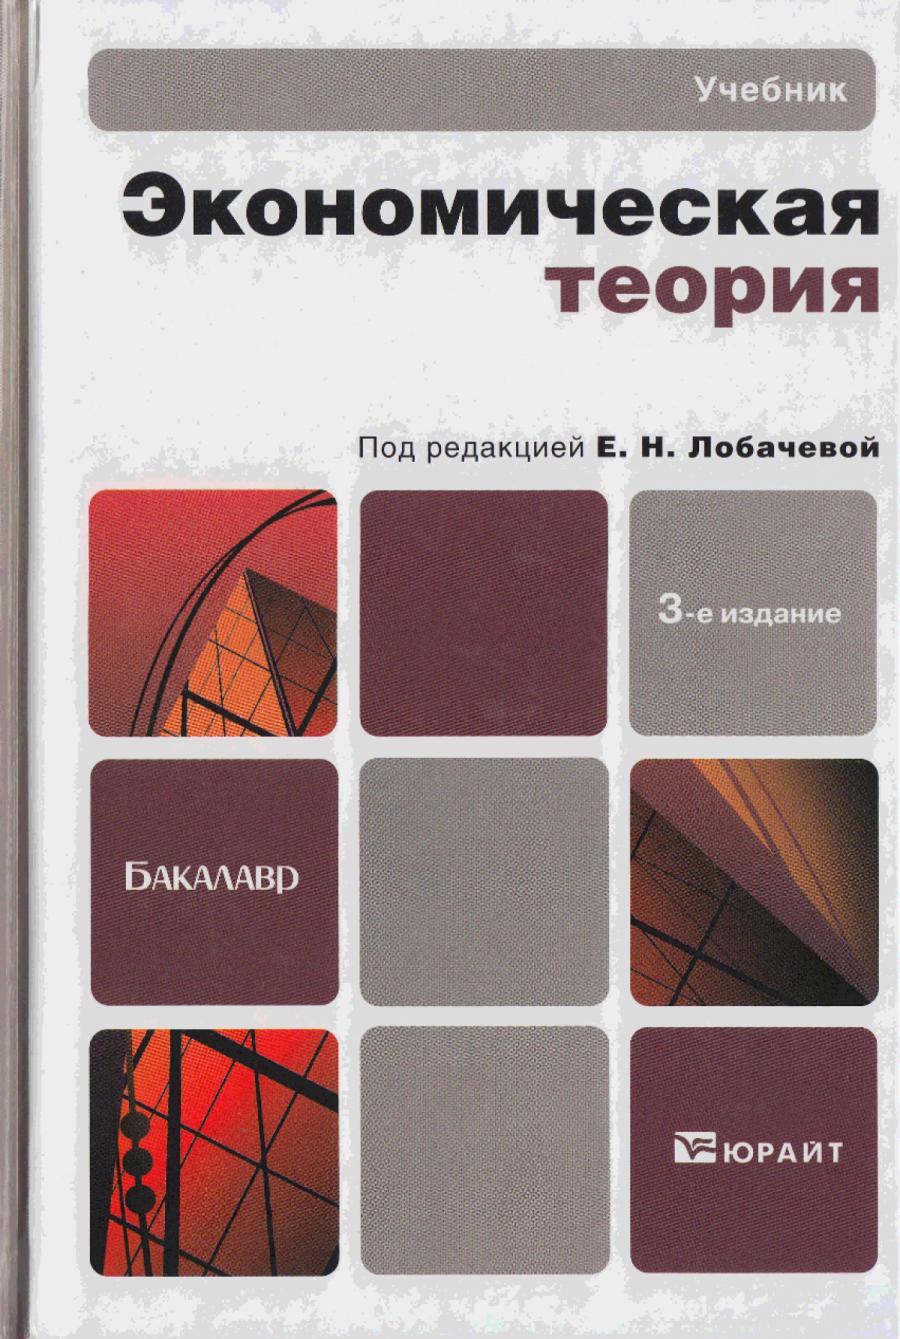 Обложка книги:  лобачева е.н. - экономическая теория (3-е изд.)